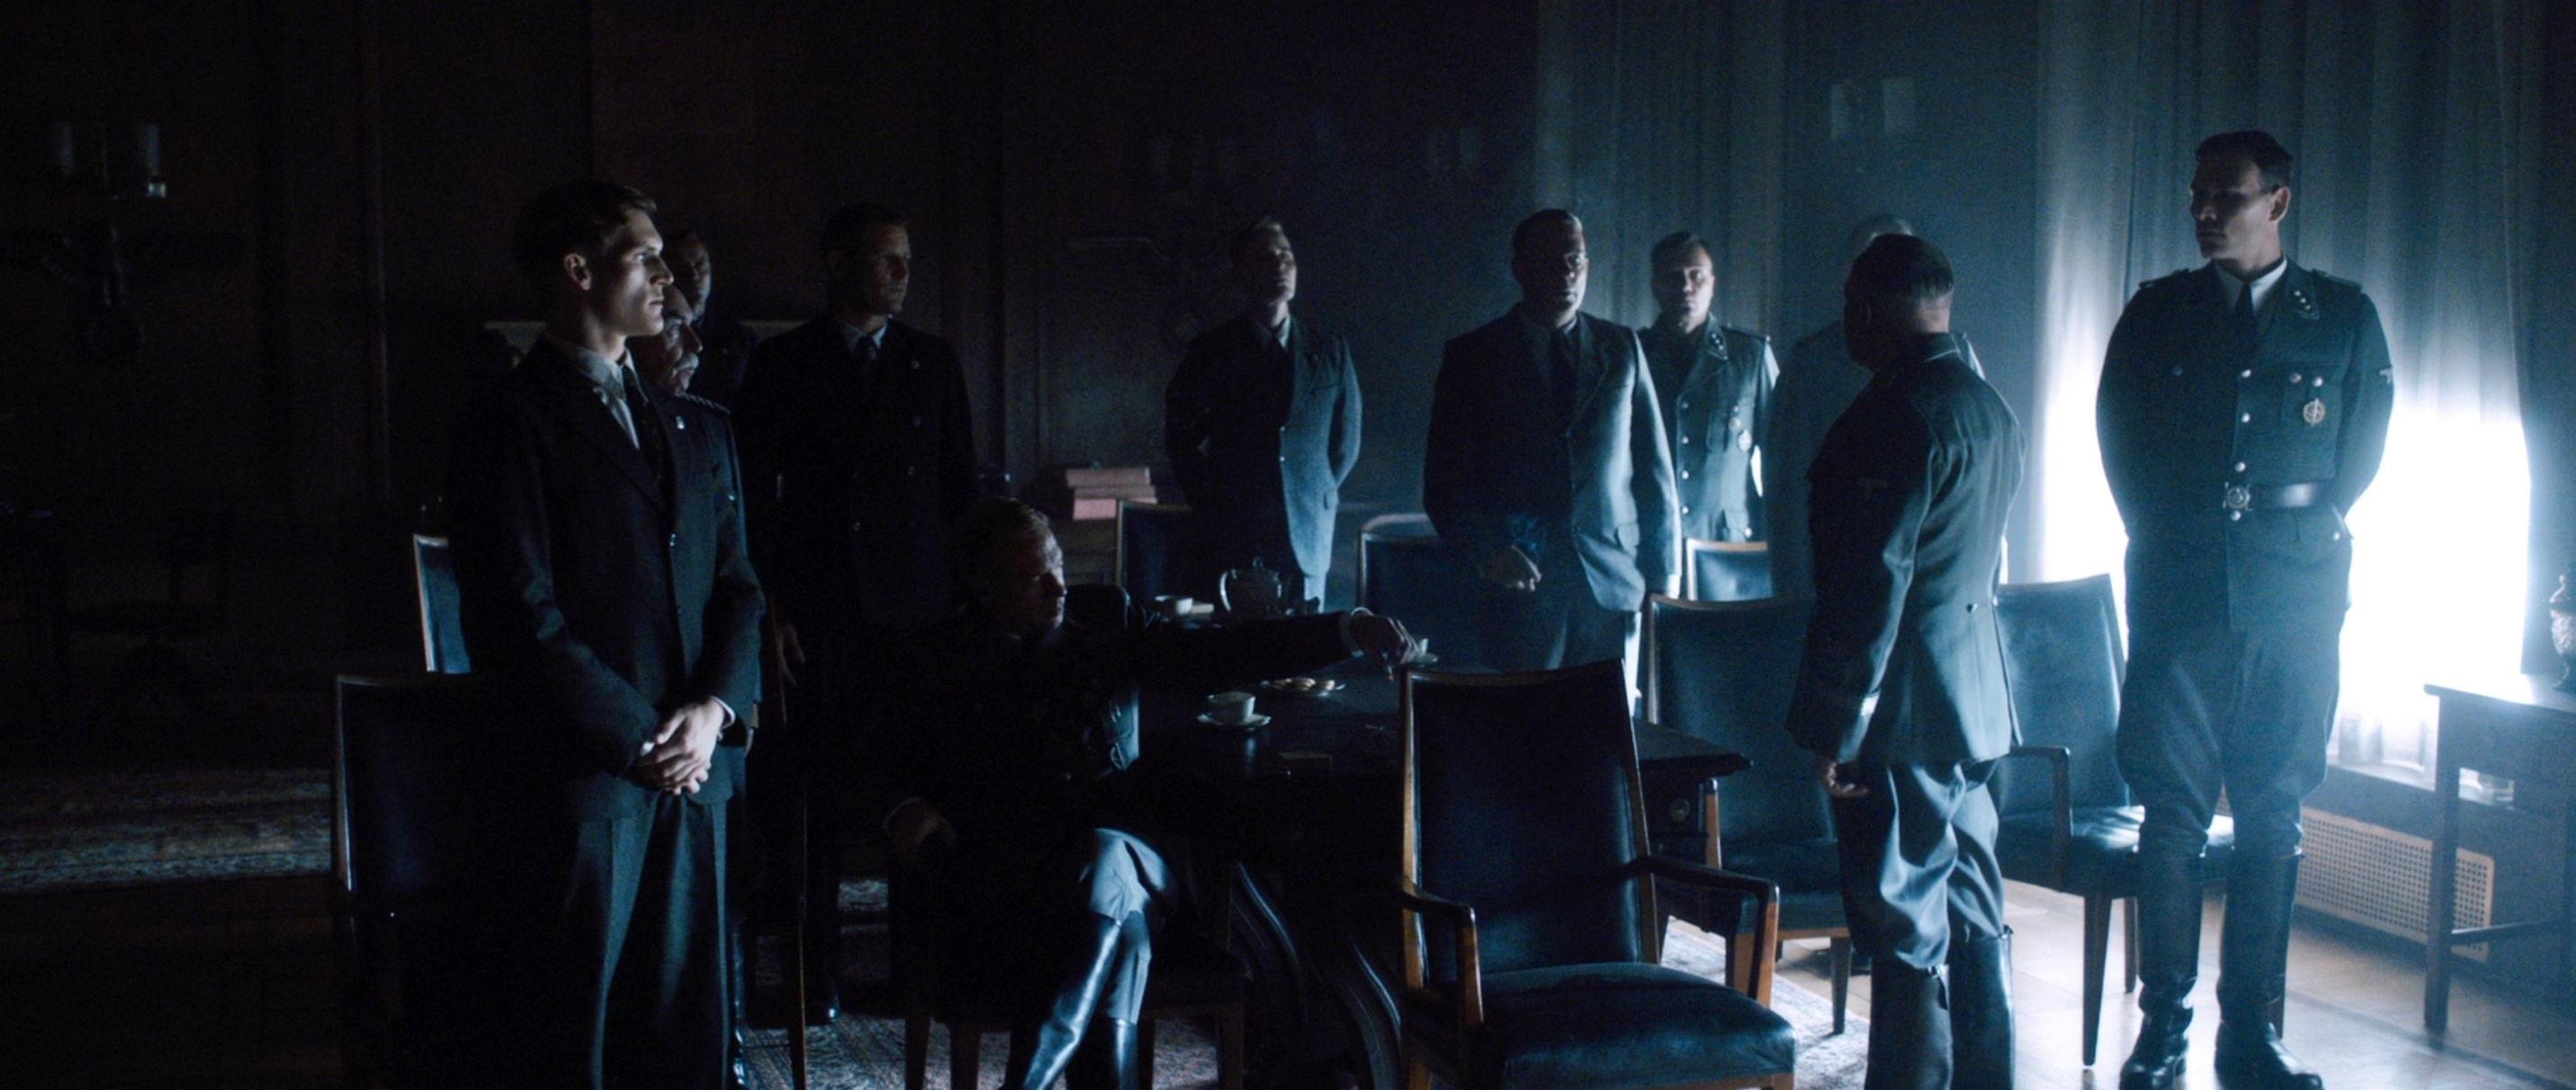 Elser - 13 Minutes - Gestapo - Regie Oliver Hirschbiegel - Kamera Judith Kaufmann